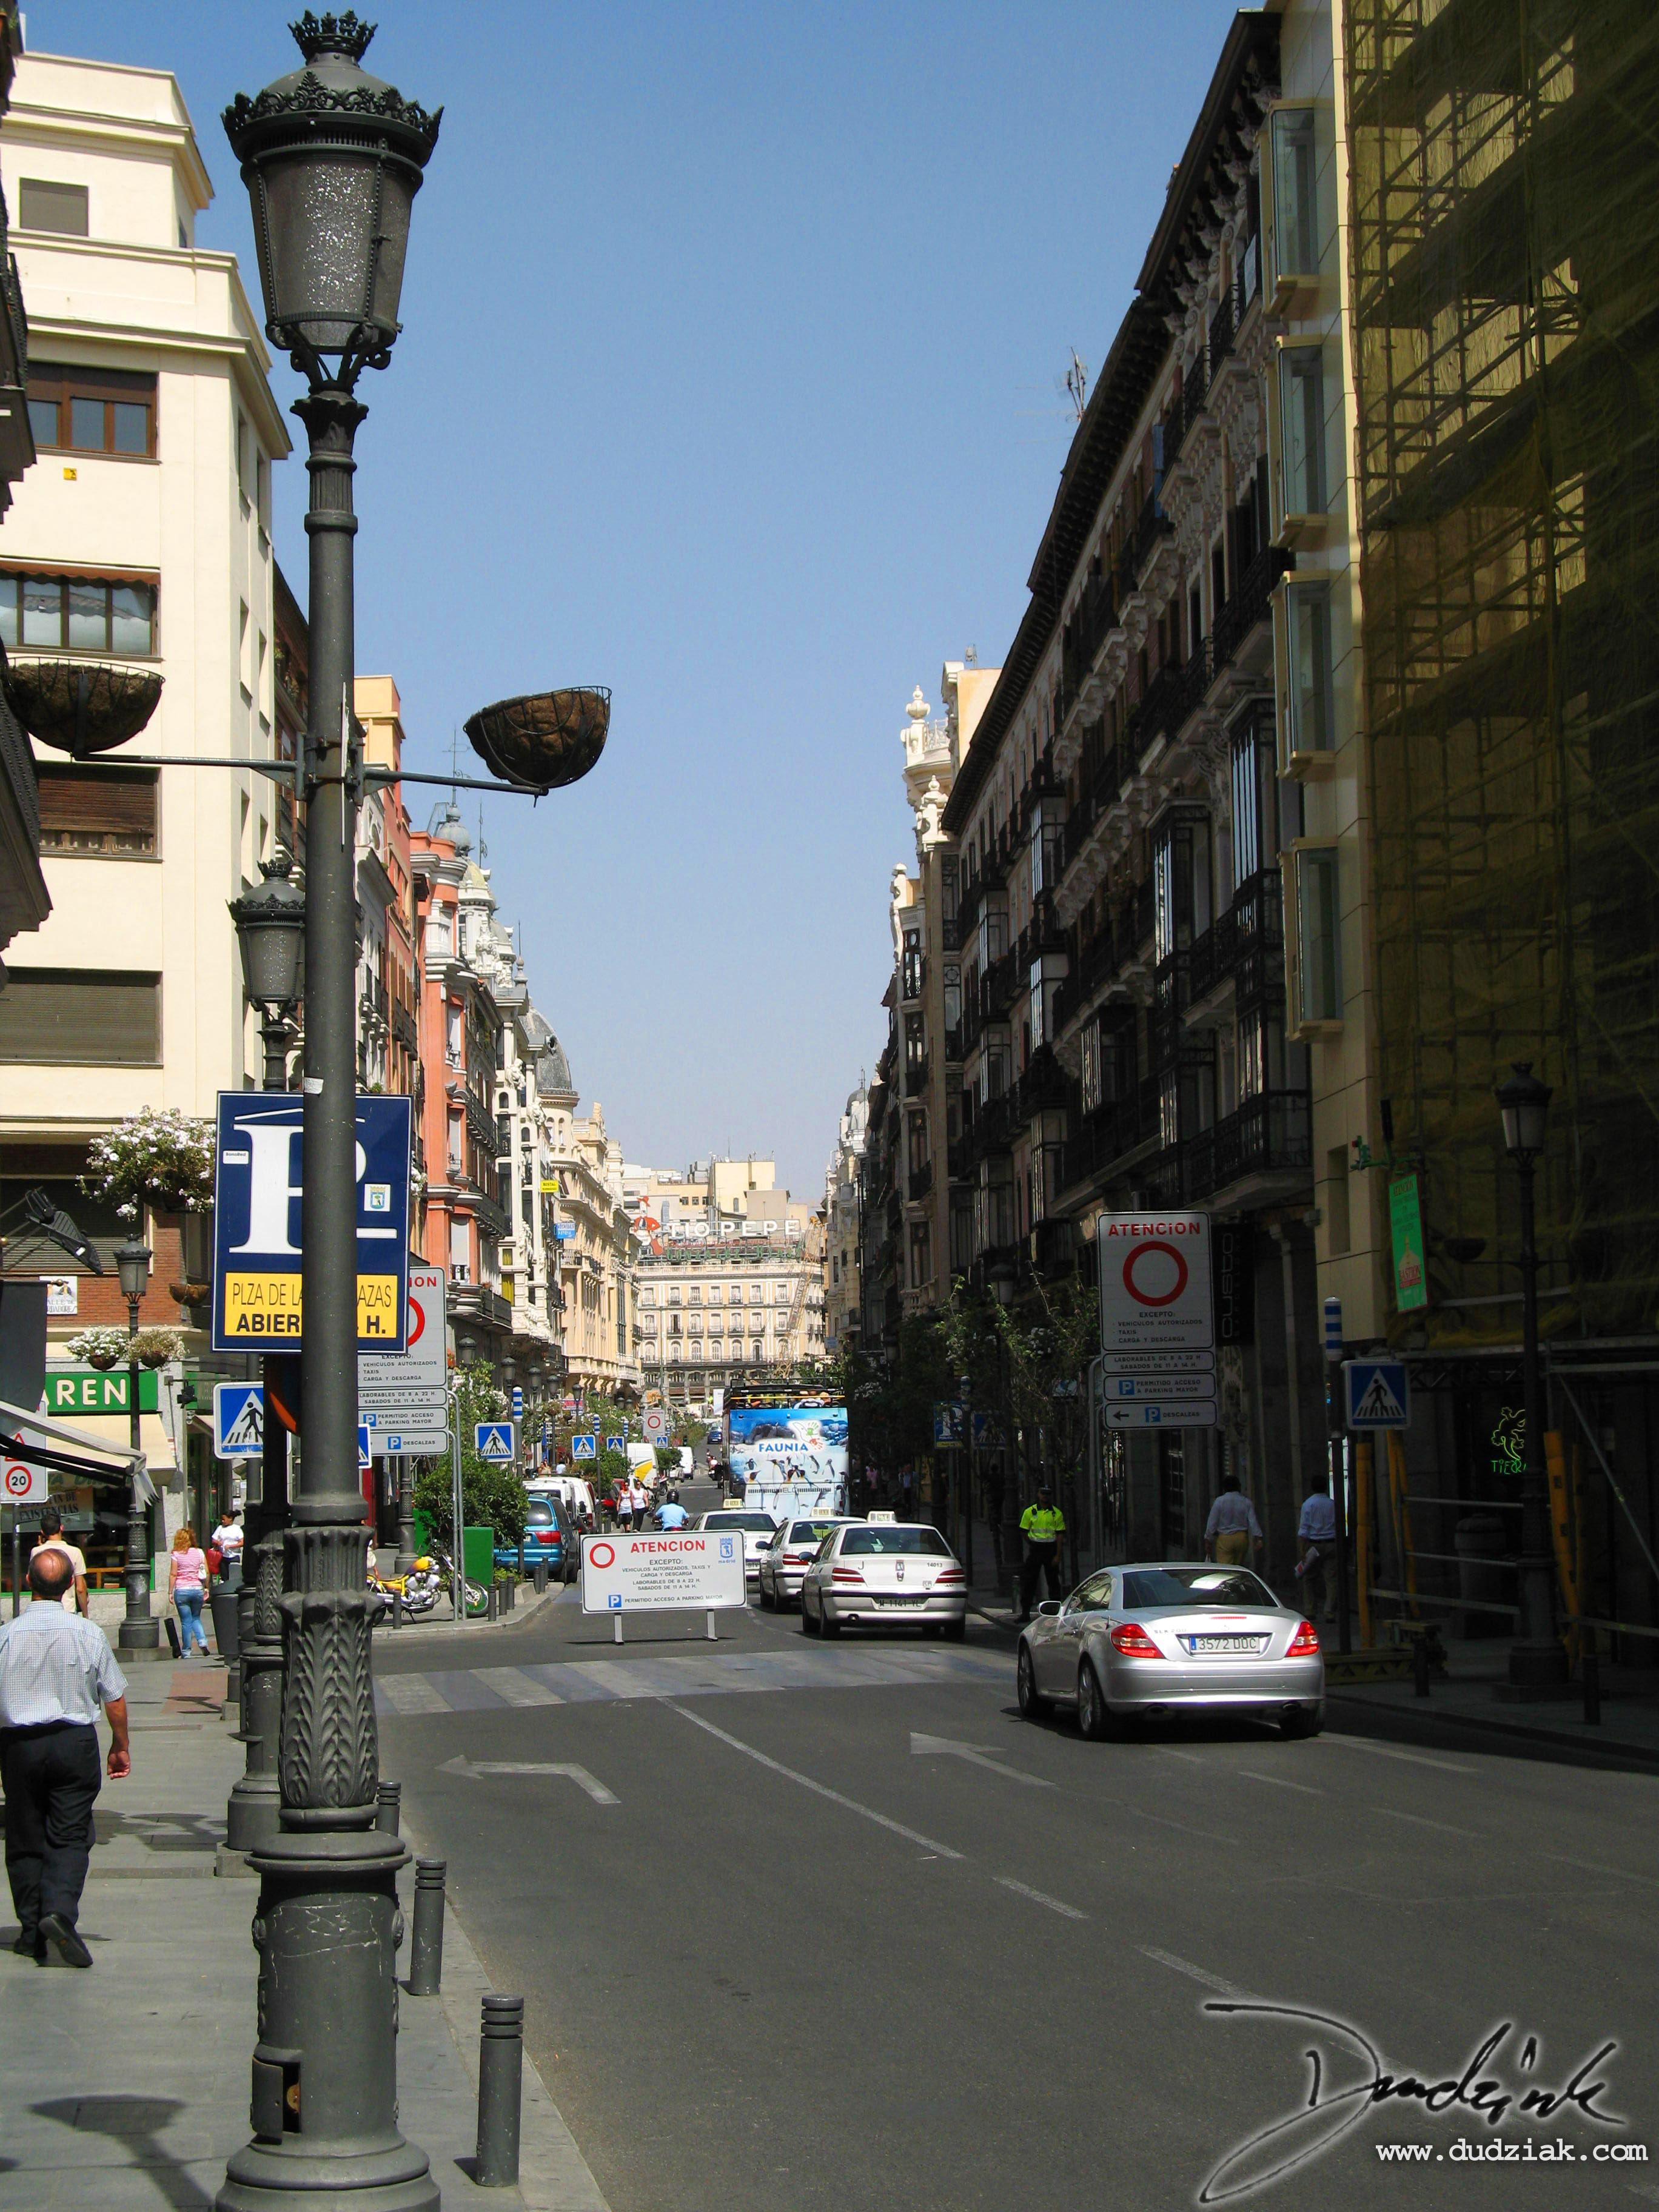 streets of madrid 2736x3648